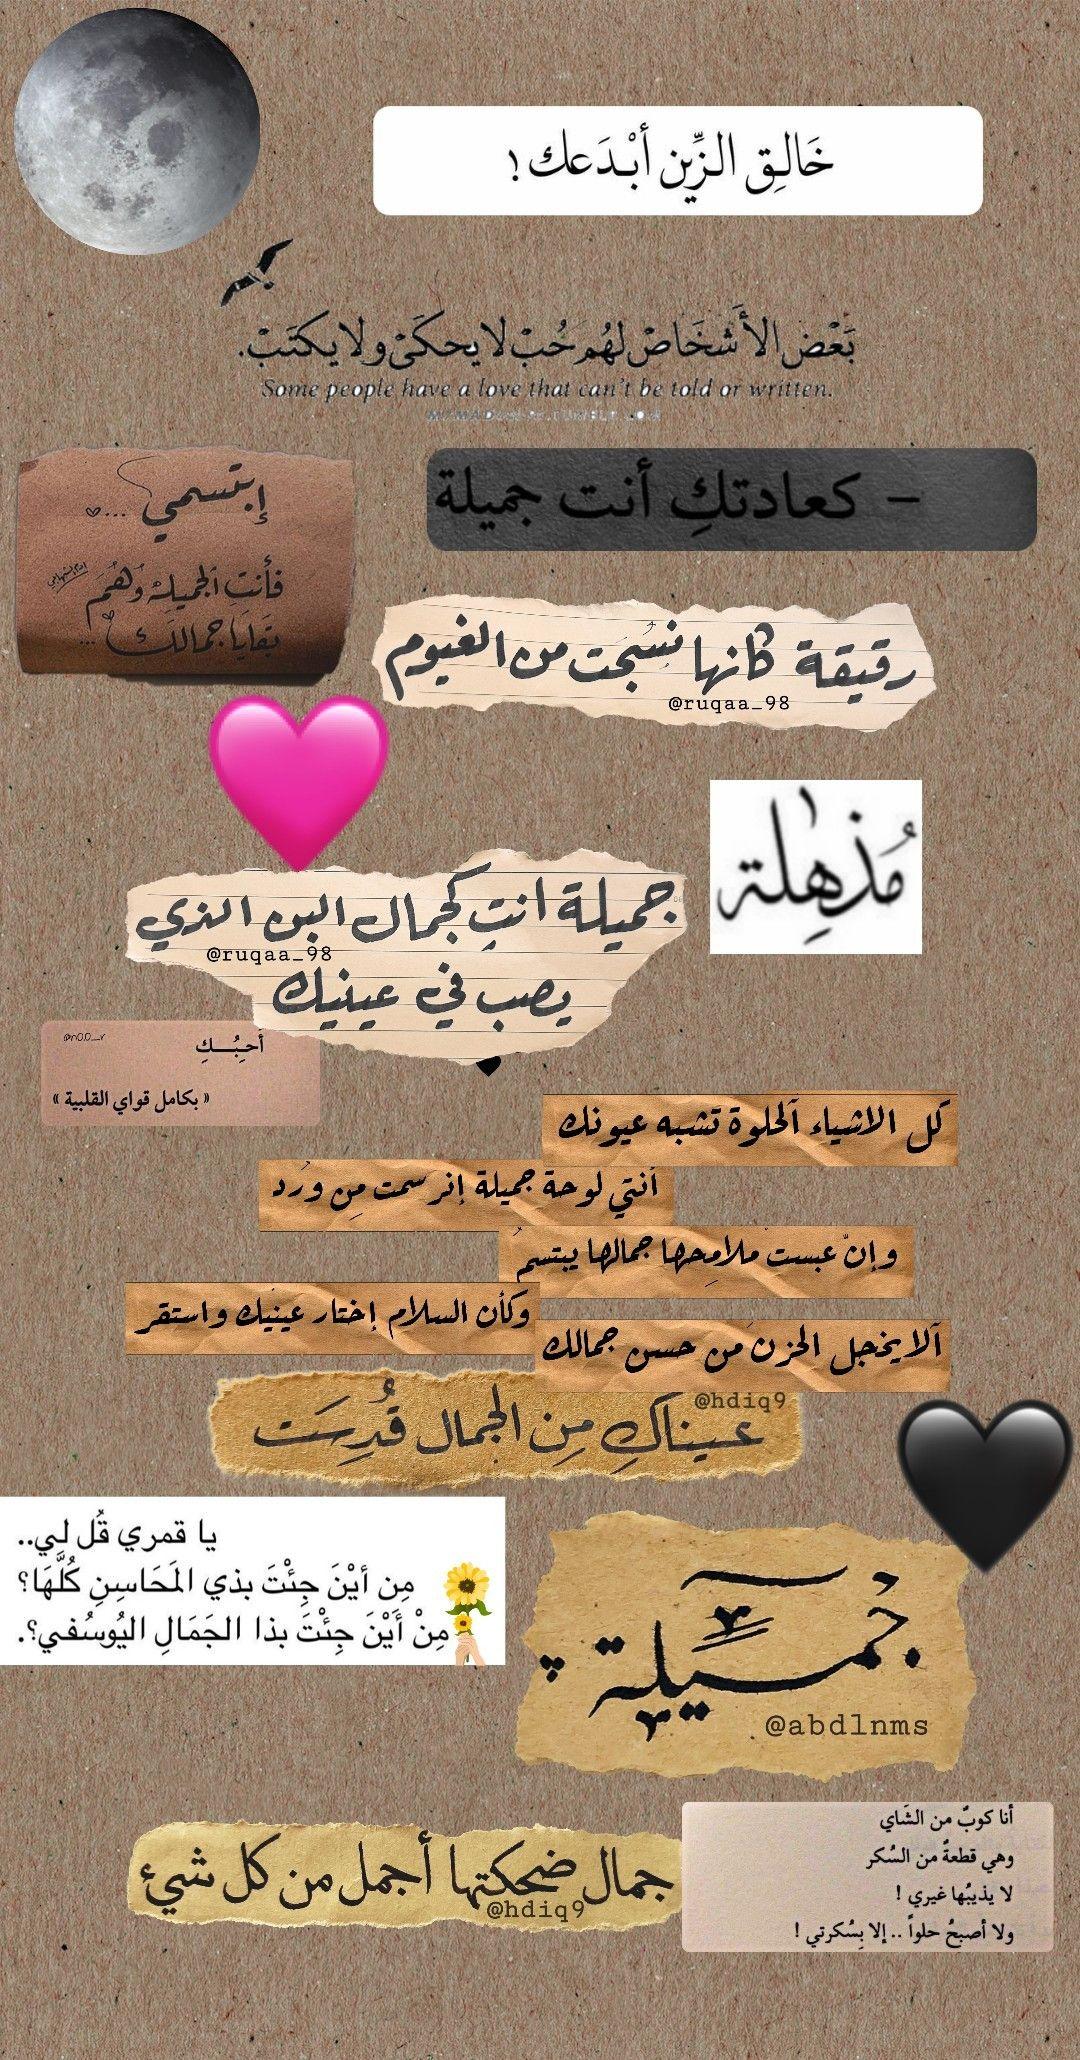 ملصقات سناب Iphone Wallpaper Quotes Love Calligraphy Quotes Love Love Quotes Wallpaper